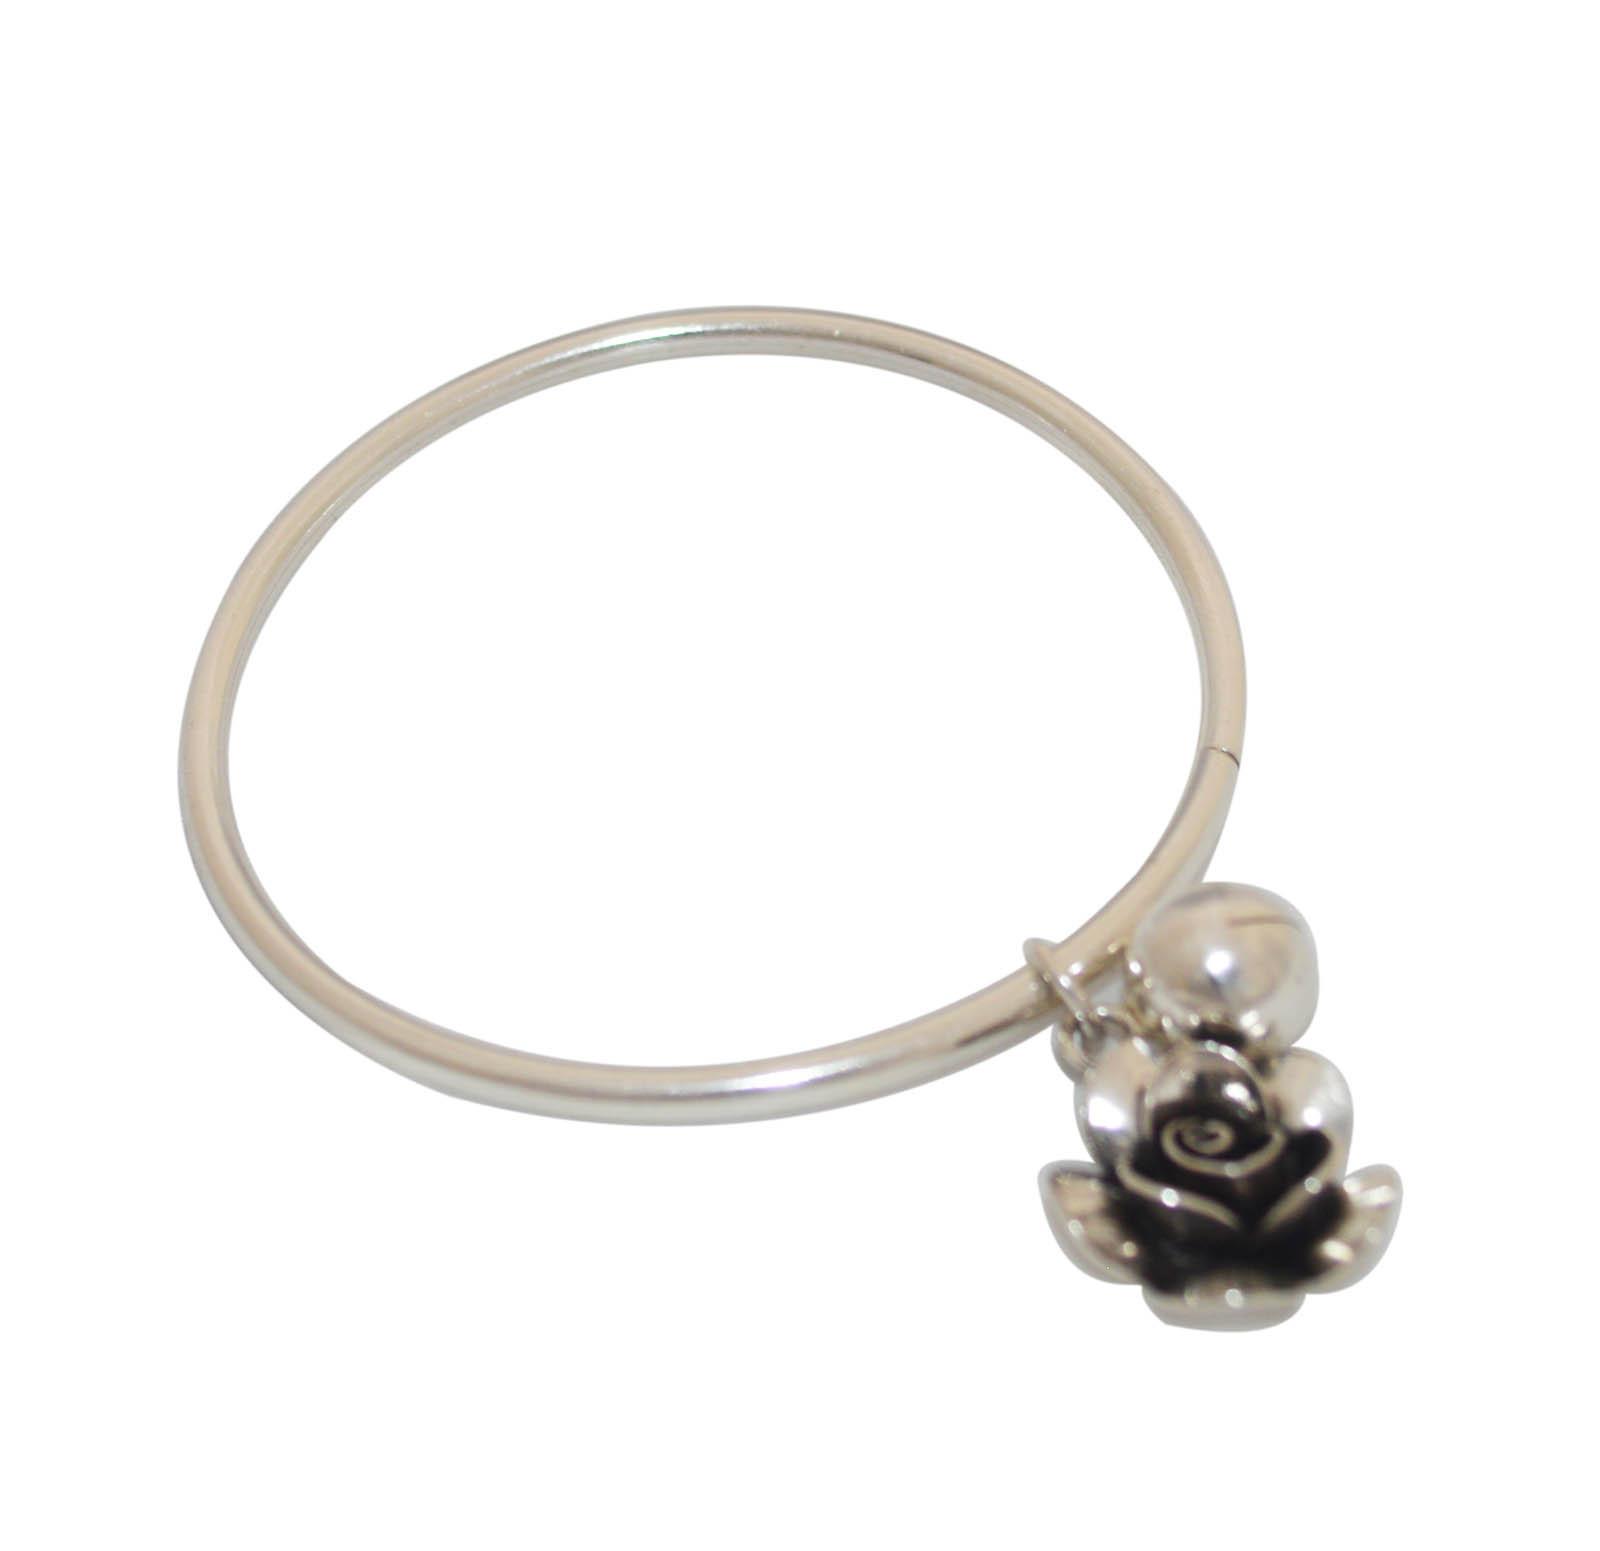 Handmade Silver Flower Bangle